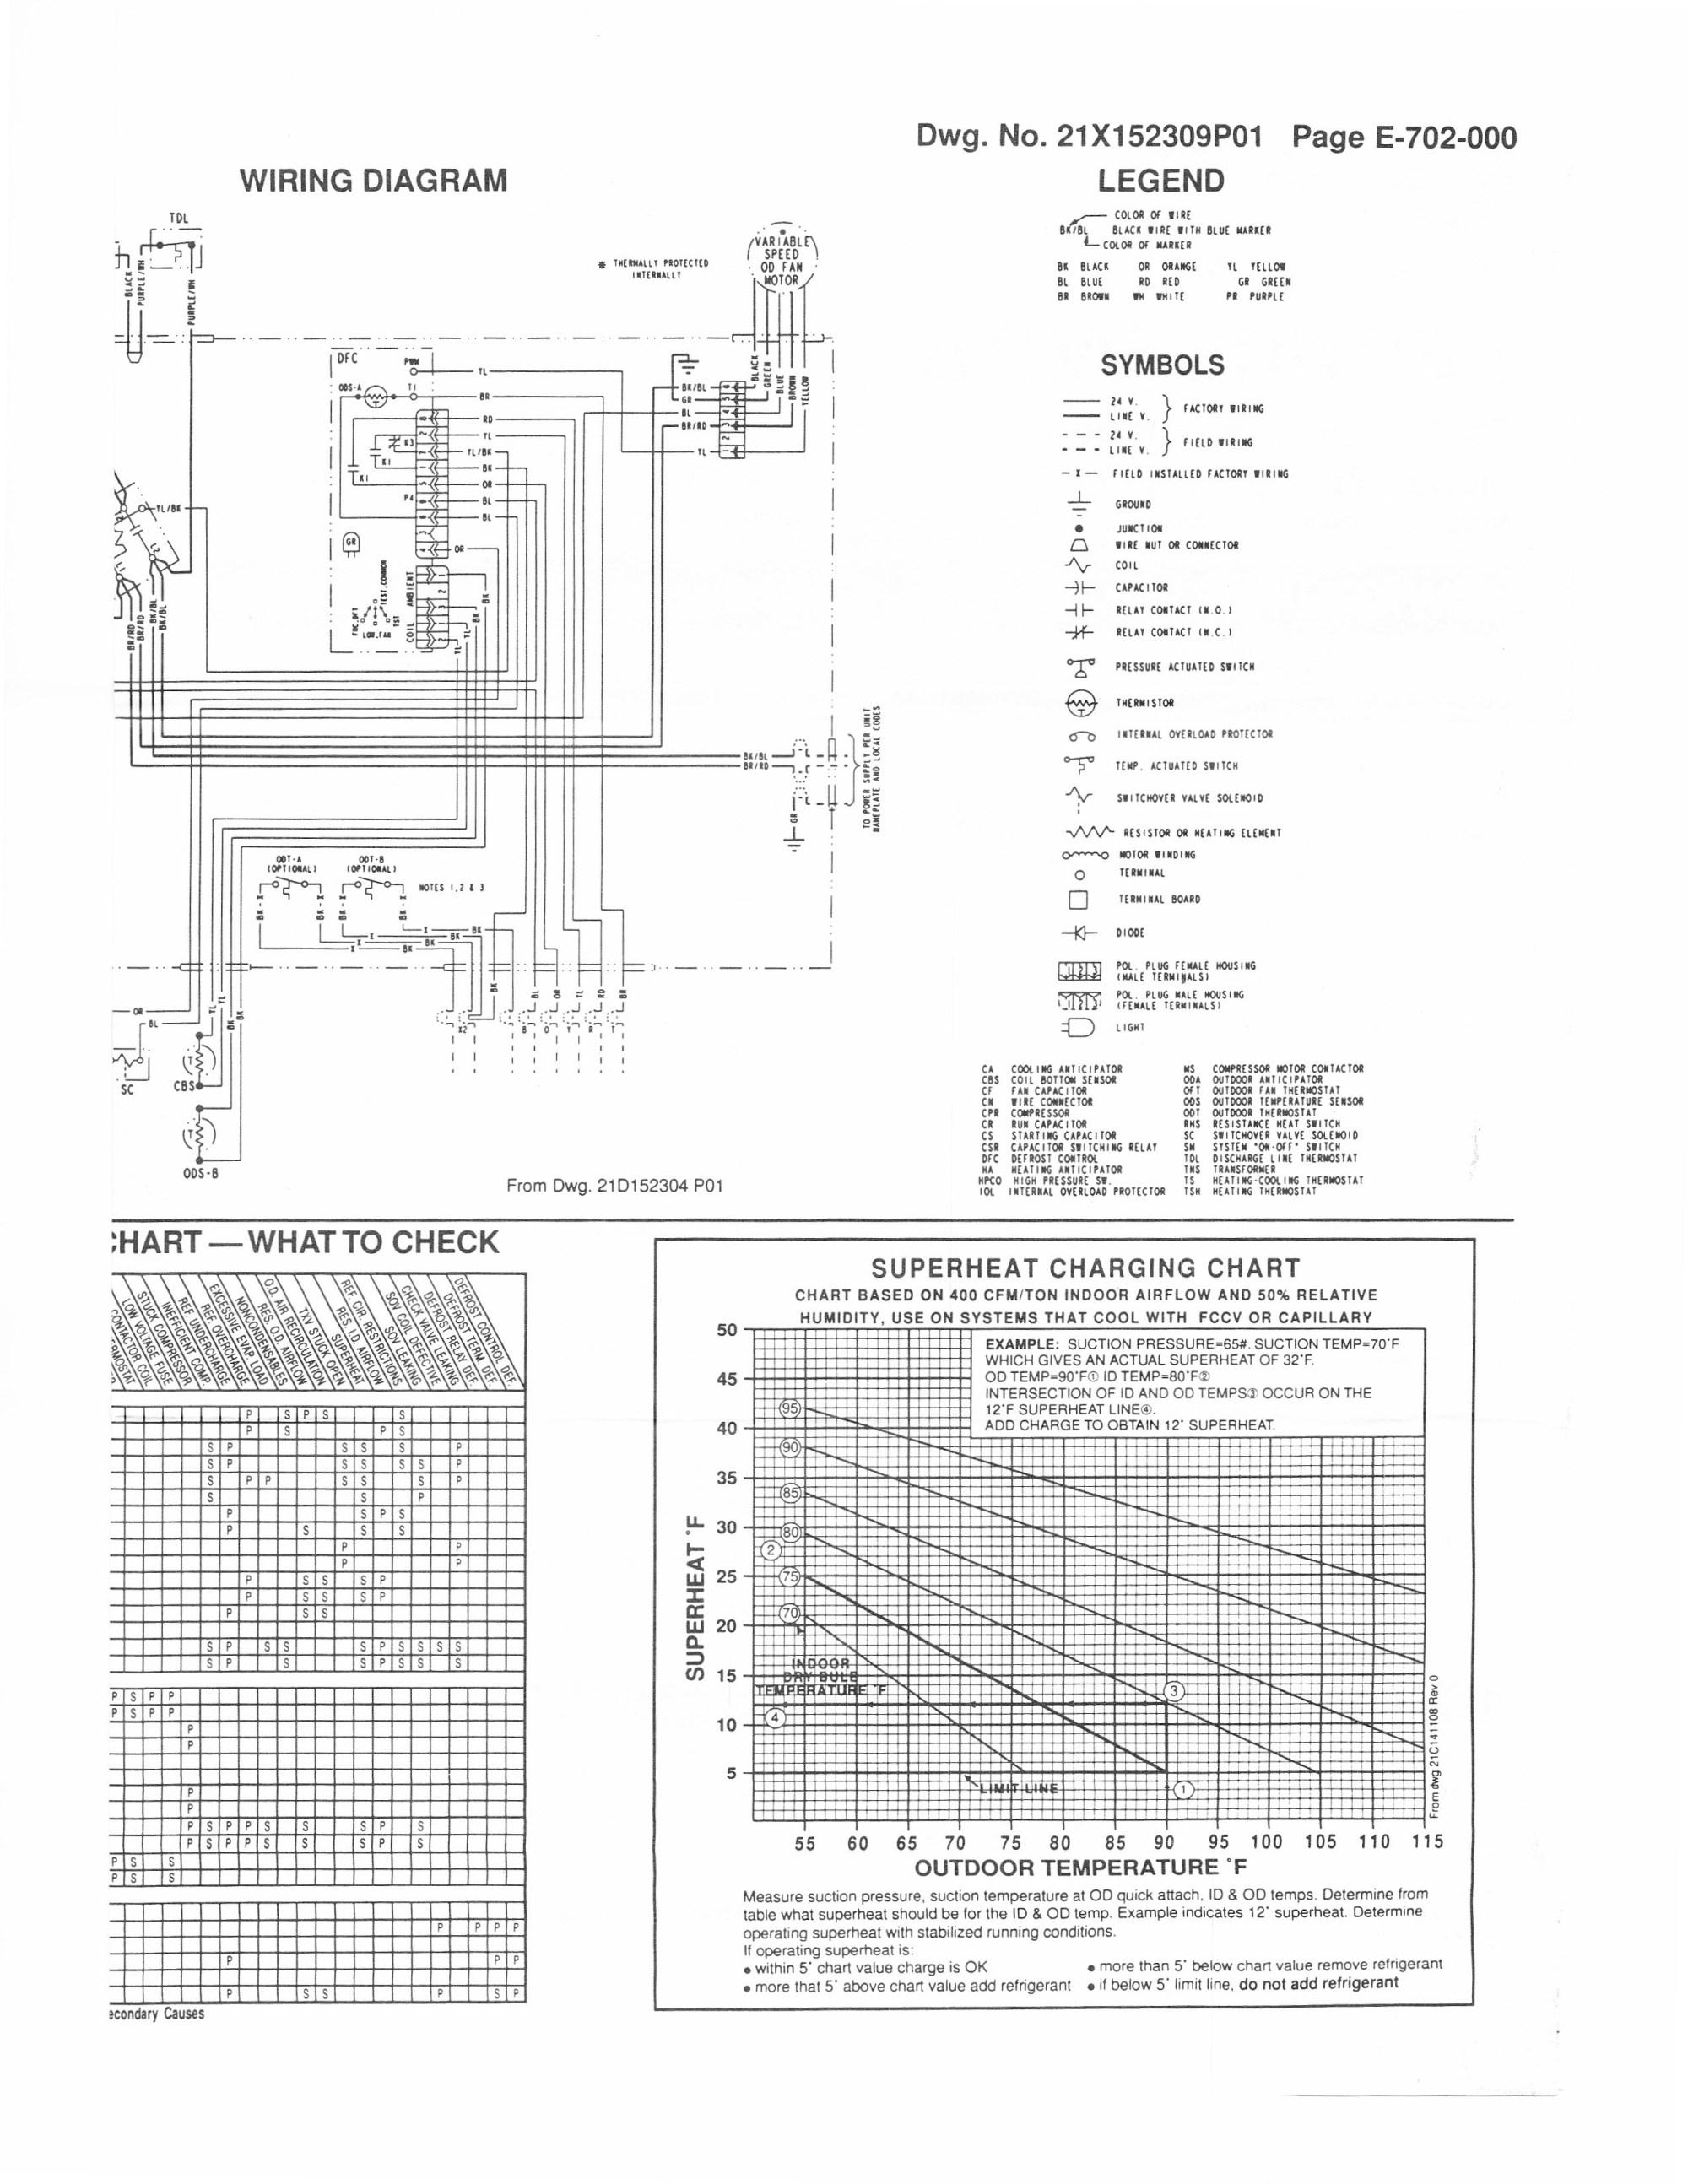 hight resolution of trane xr13 wiring diagram wiring schematic diagramtrane xl13i wiring diagram wiring library trane thermostat trane ac